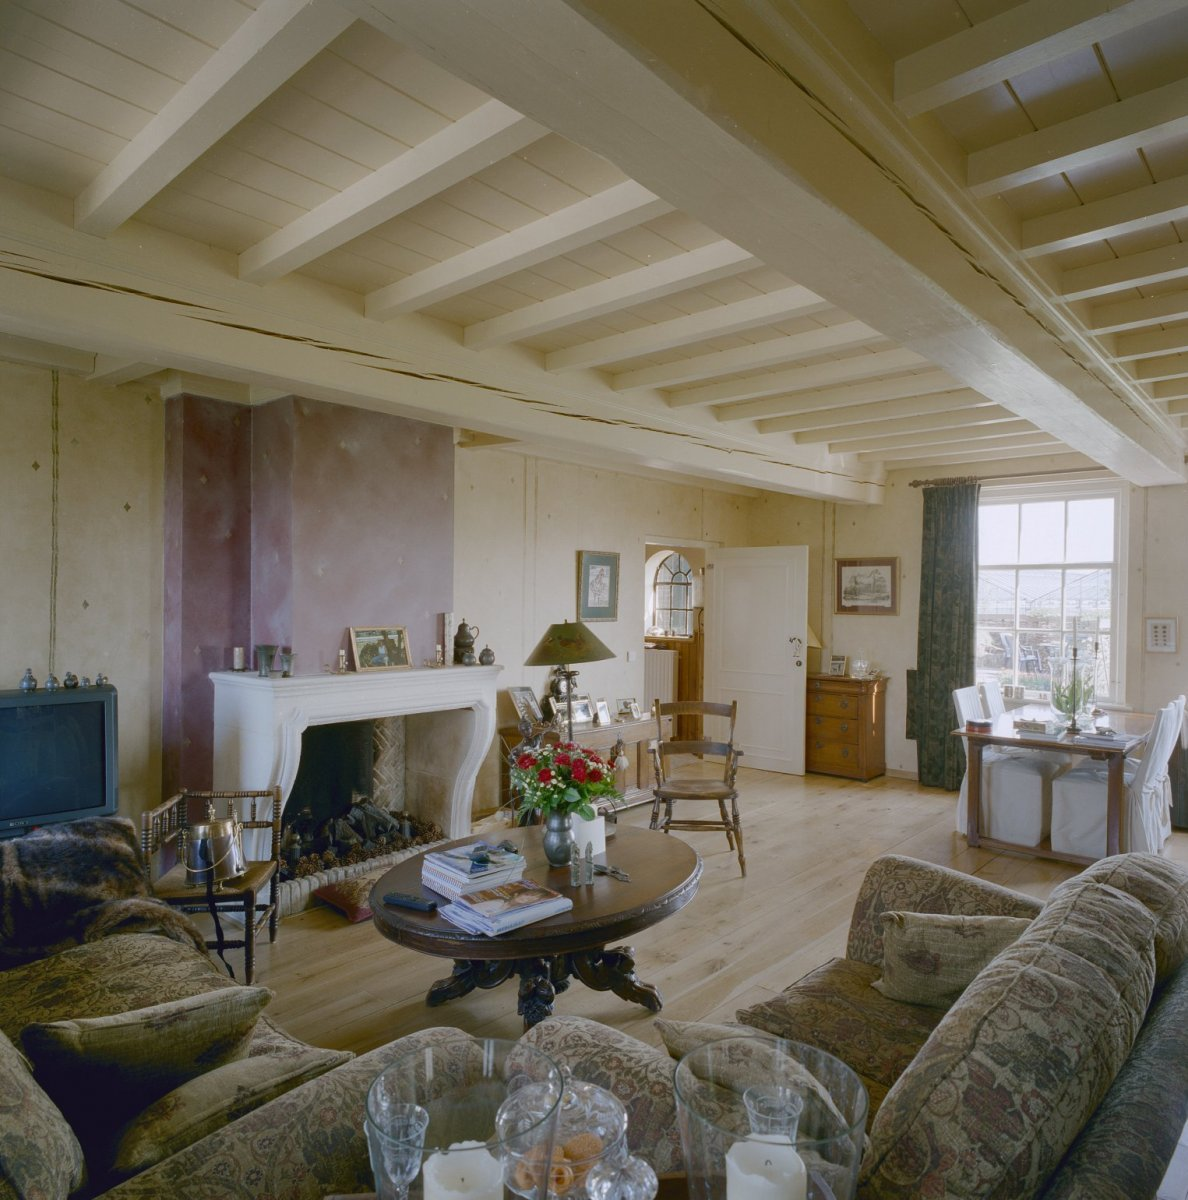 File:Interieur woonkamer met houten plafond, voorheen stalgedeelte ...